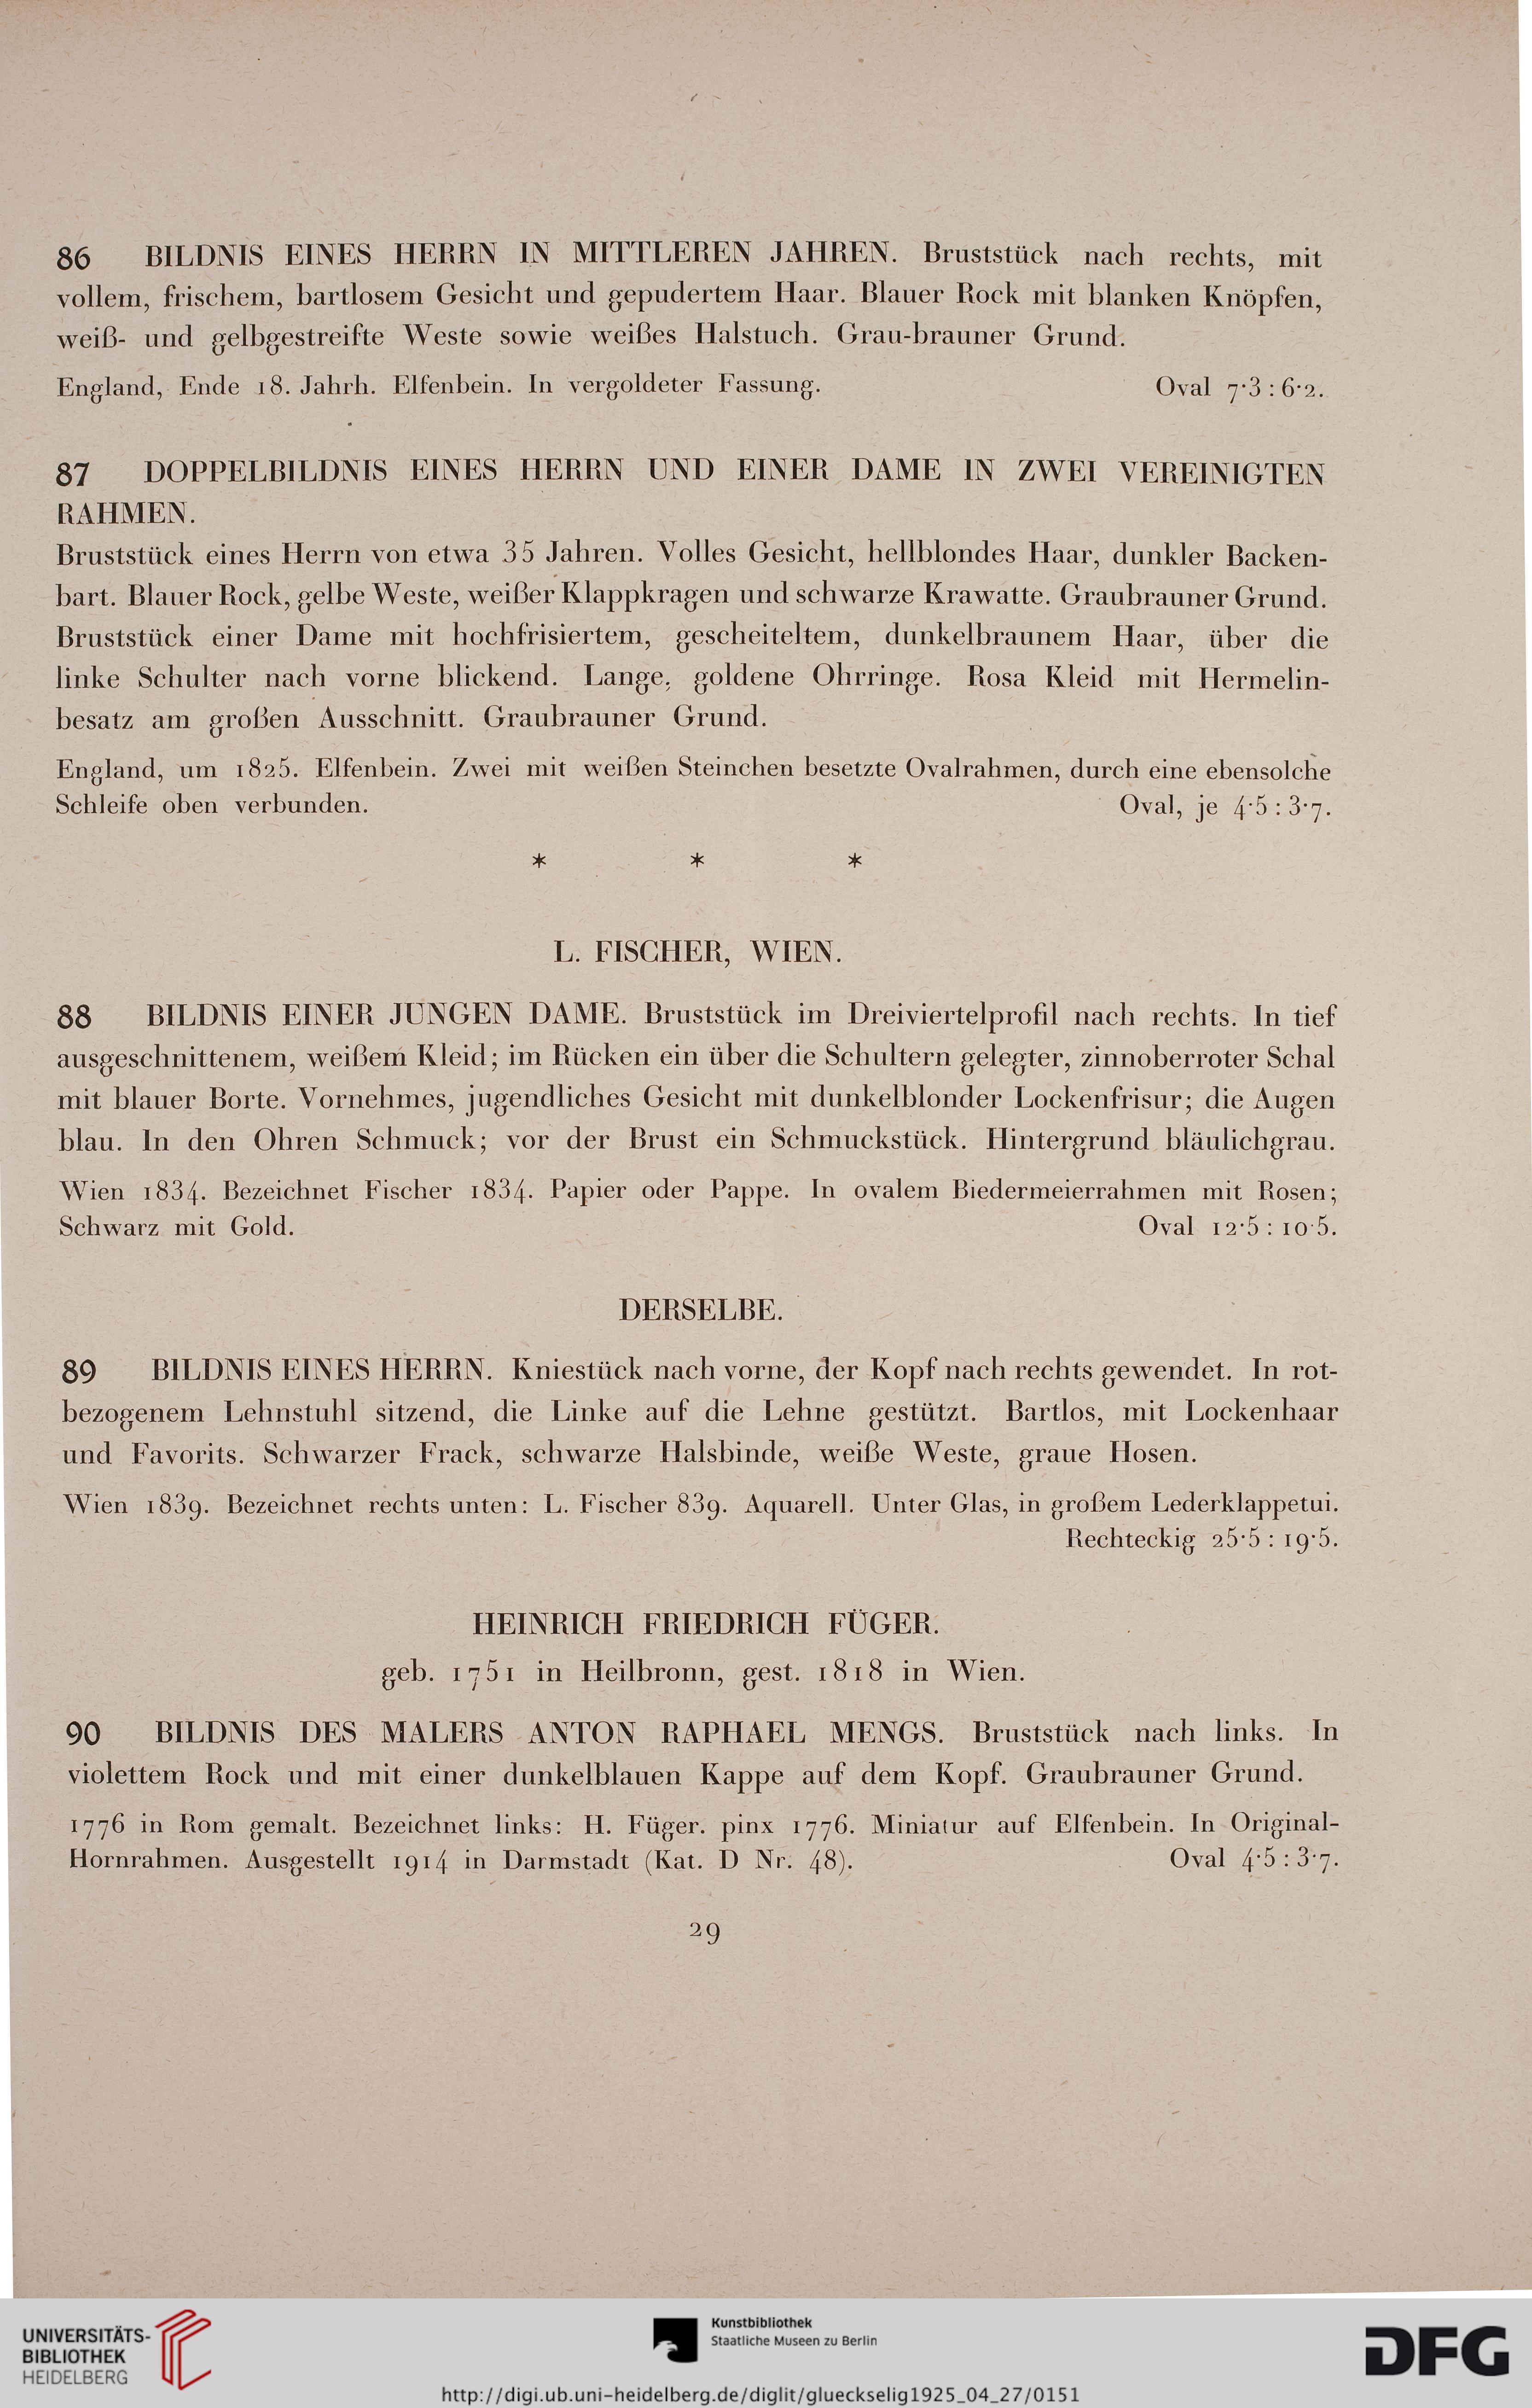 Auktionshaus Fur Altertumer Gluckselig Wien Hrsg Sammlung Kommerzienrat Jacques Muhsam Berlin Porzellan April 1925 Versteigerung Montag 27 April Bis Inklusive Donnerstag 30 April Wien 1925